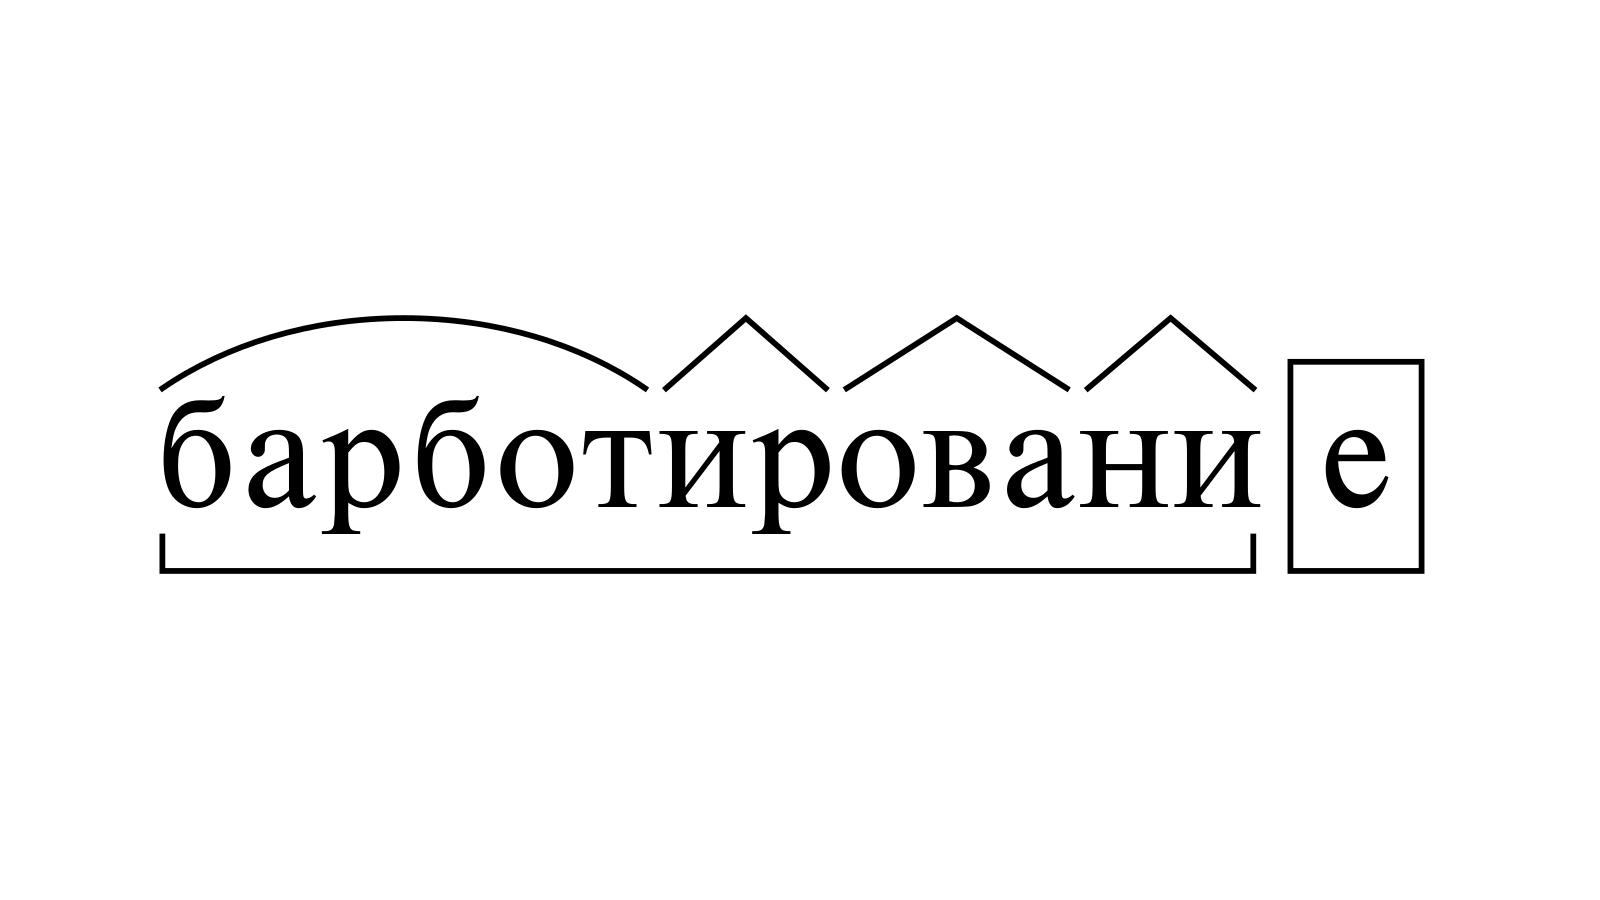 Разбор слова «барботирование» по составу